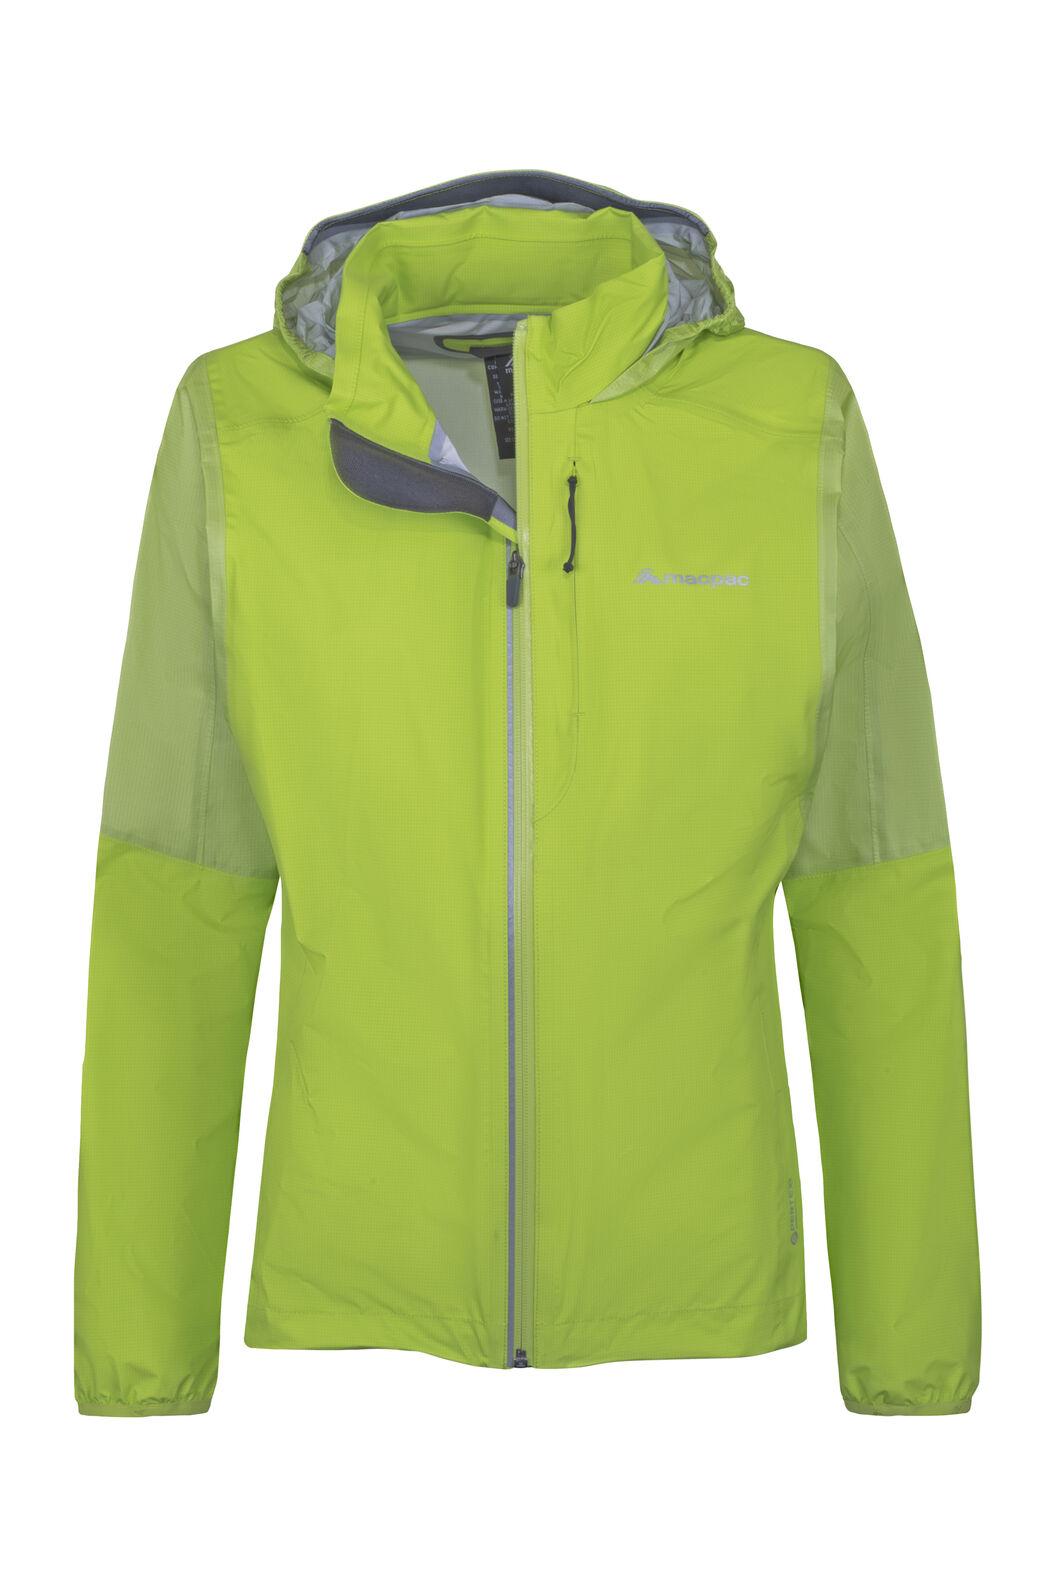 Macpac Transition Pertex® Shield Rain Jacket — Women's, Macaw Green, hi-res